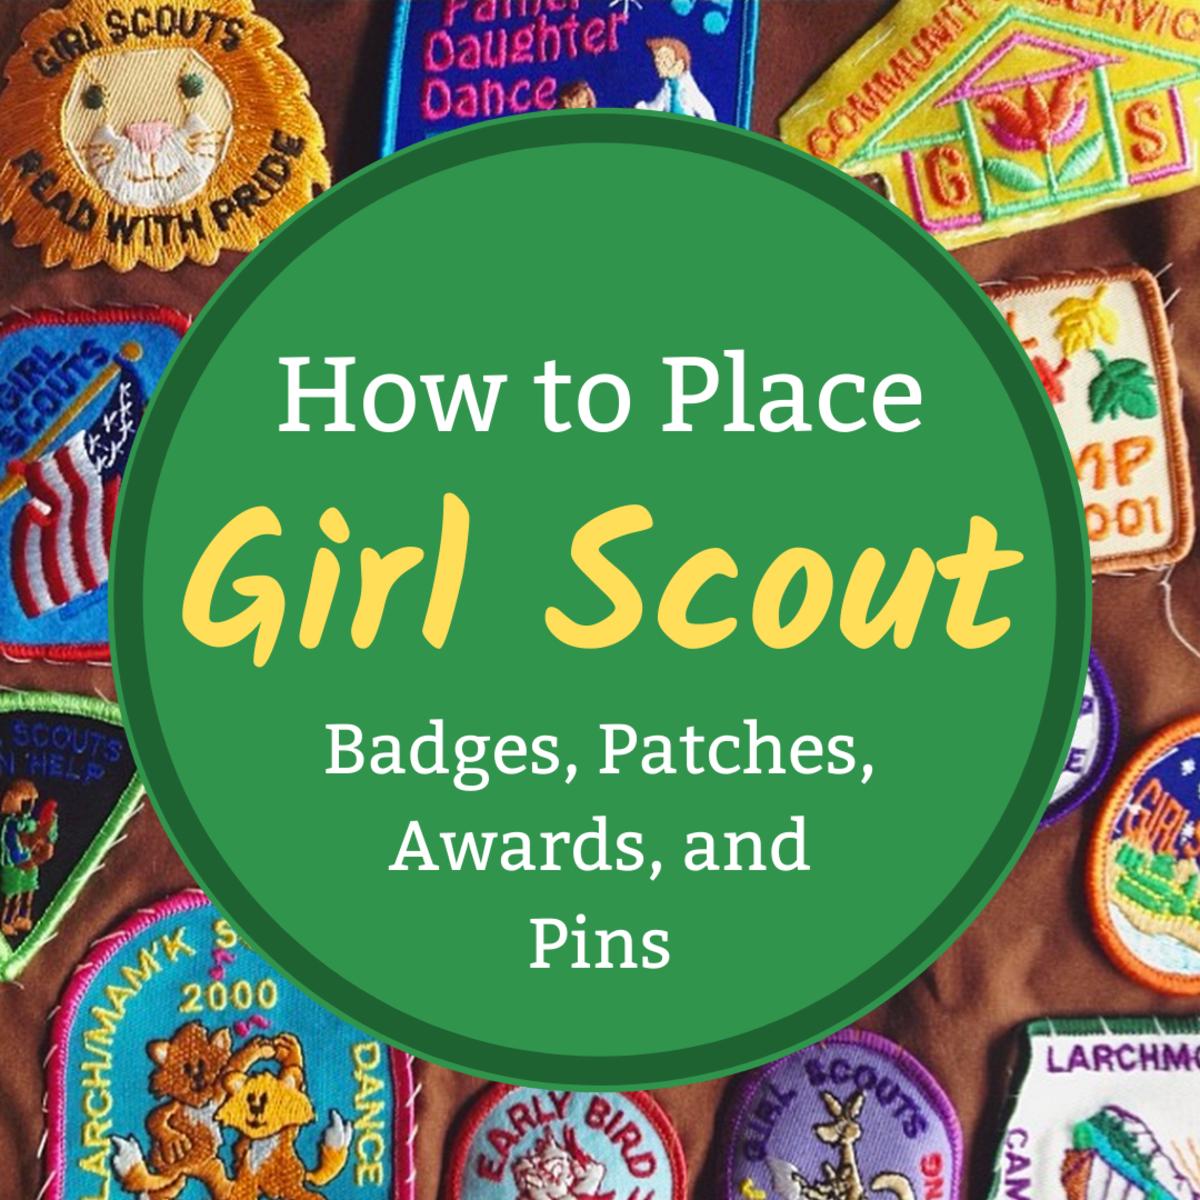 Mak-A-Wish Wish Challenge Girl Guide Badge New